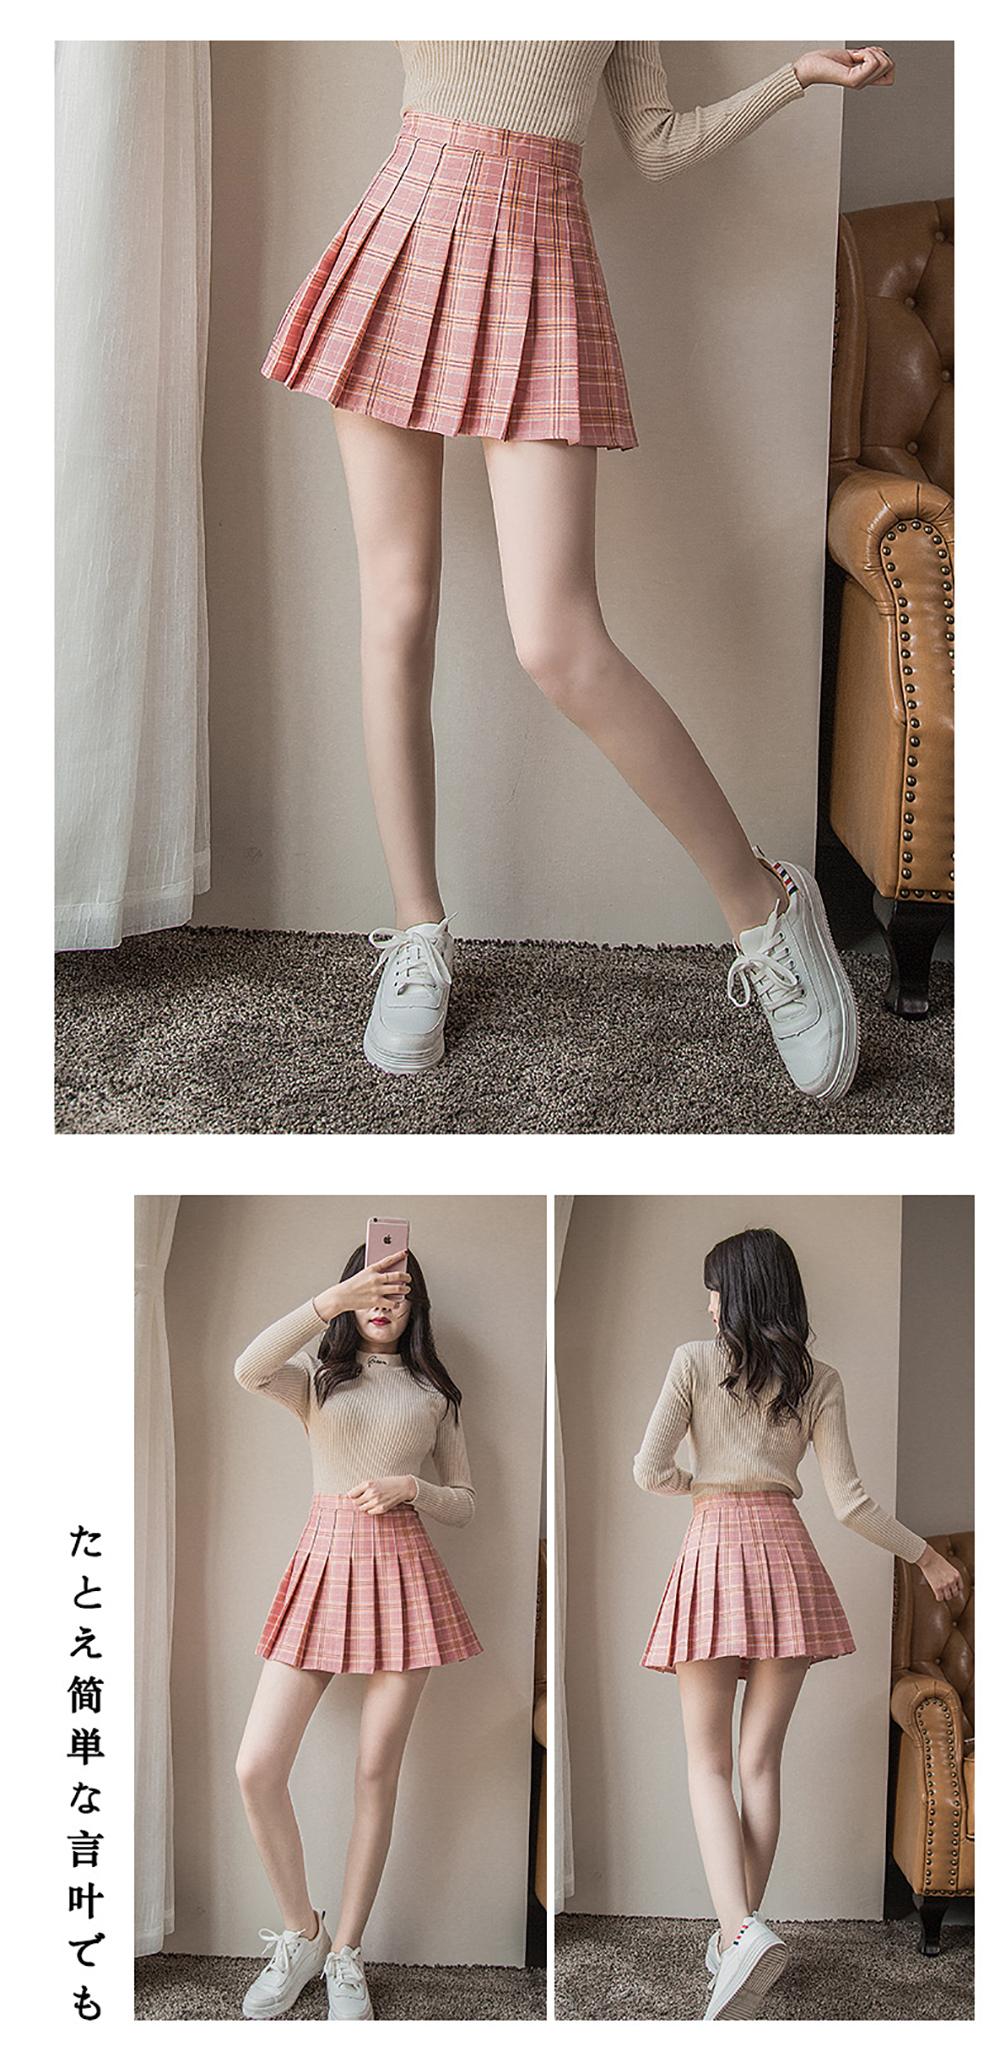 Plus Size Harajuku Short Skirt New Korean Plaid Skirt Women Zipper High Waist School Girl Pleated Plaid Skirt Sexy Mini Skirt 10